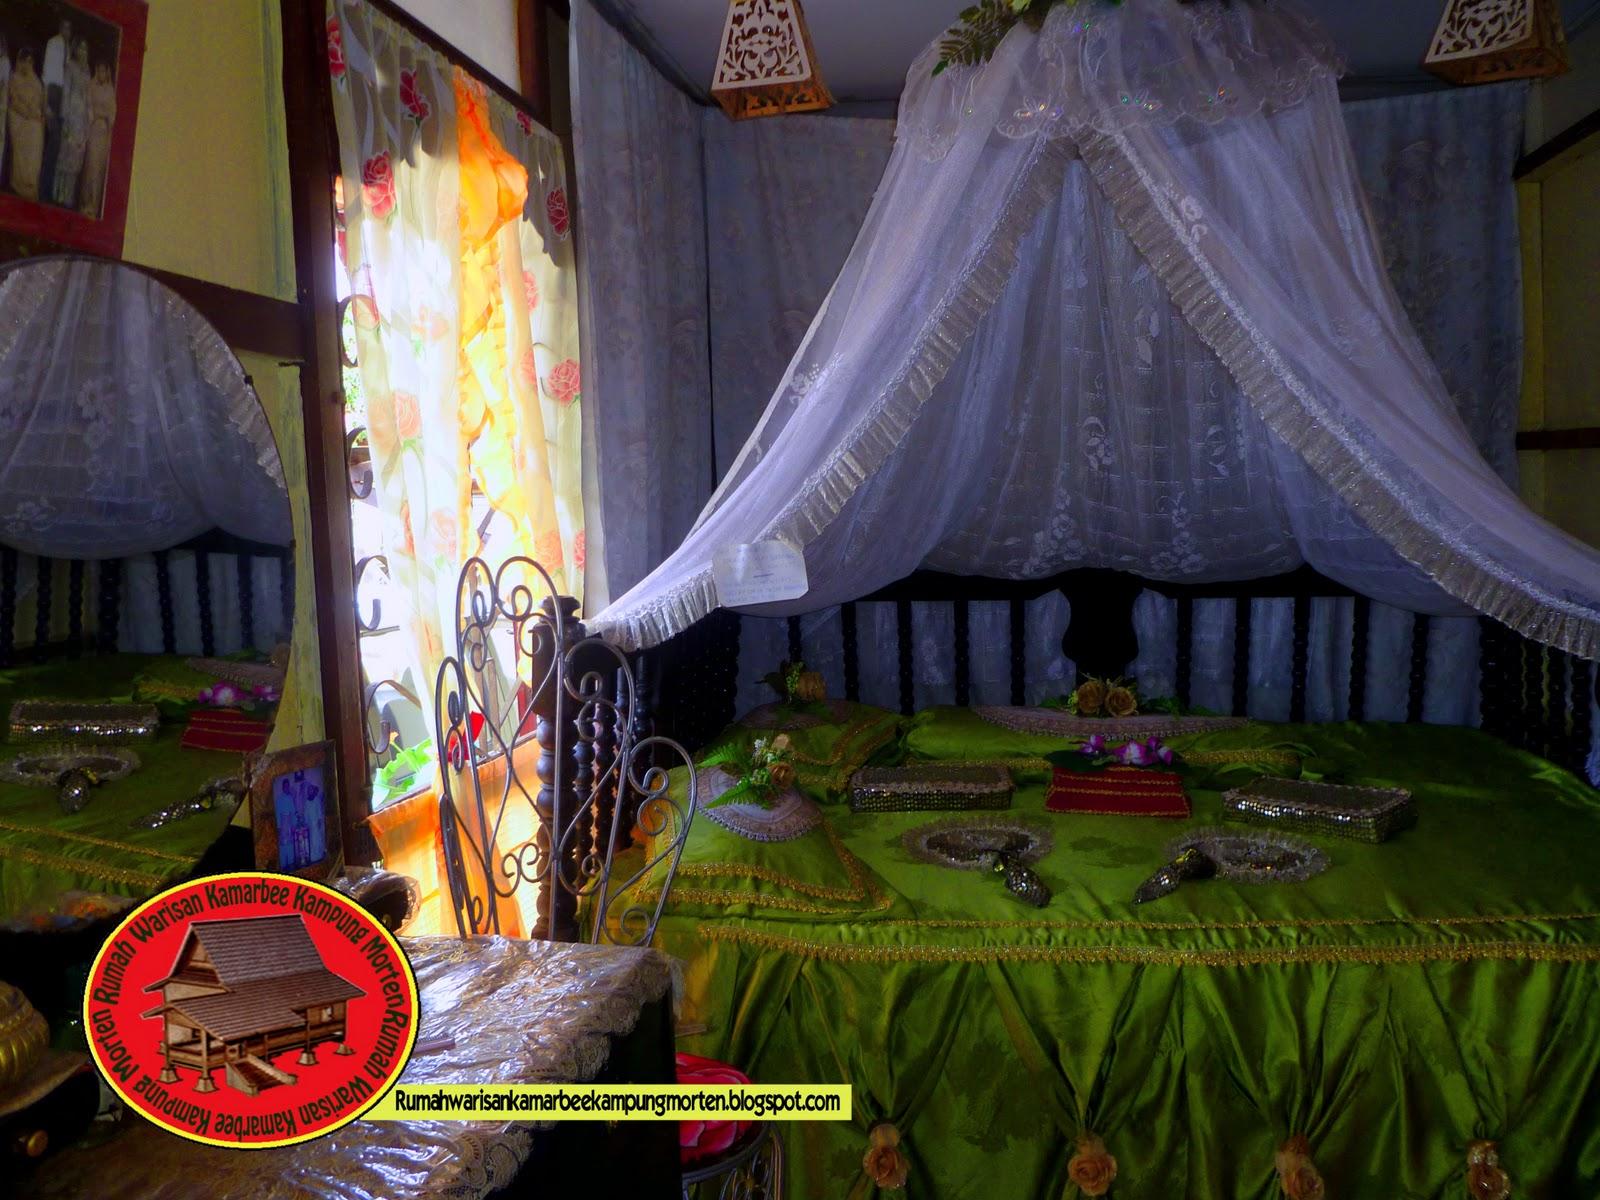 Bilik Pengantin Tradisional Di Dalam Rumah Warisan Rbee Ini Mampu Membawa Pengunjung Ke Zaman Dahulu Dengan Melihat Barang Hiasan